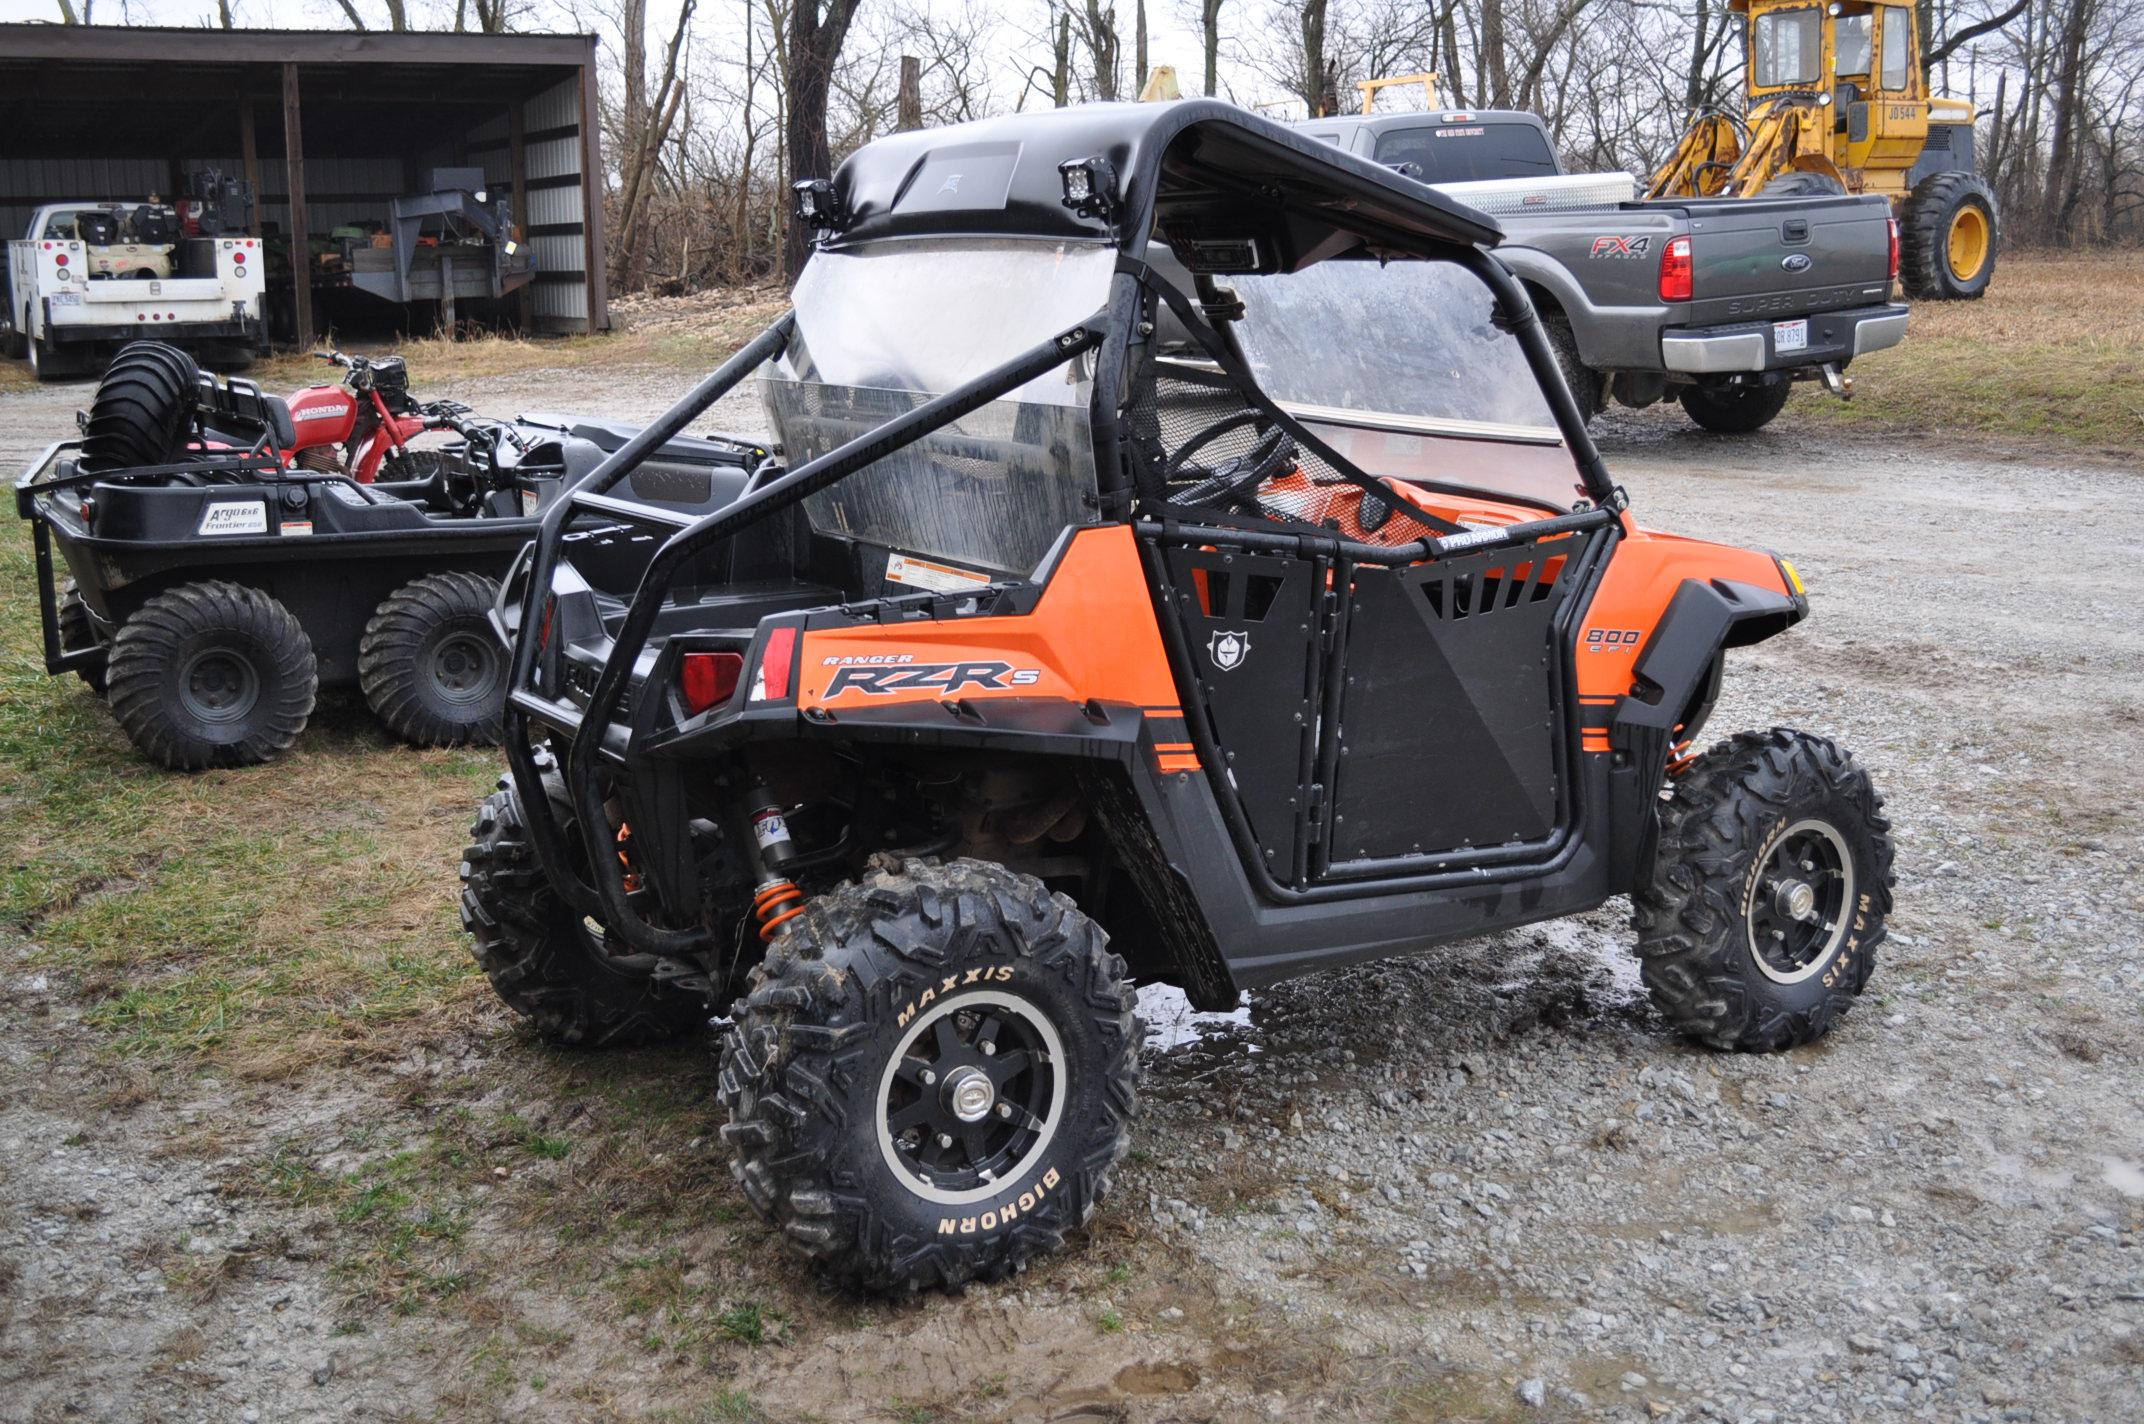 2010 Polaris Ranger RZR, 800 EFI, AT26 x 12 R 12 rear, AT26 x 9 R 12 front, half doors, 102 hrs, 899 - Image 3 of 9